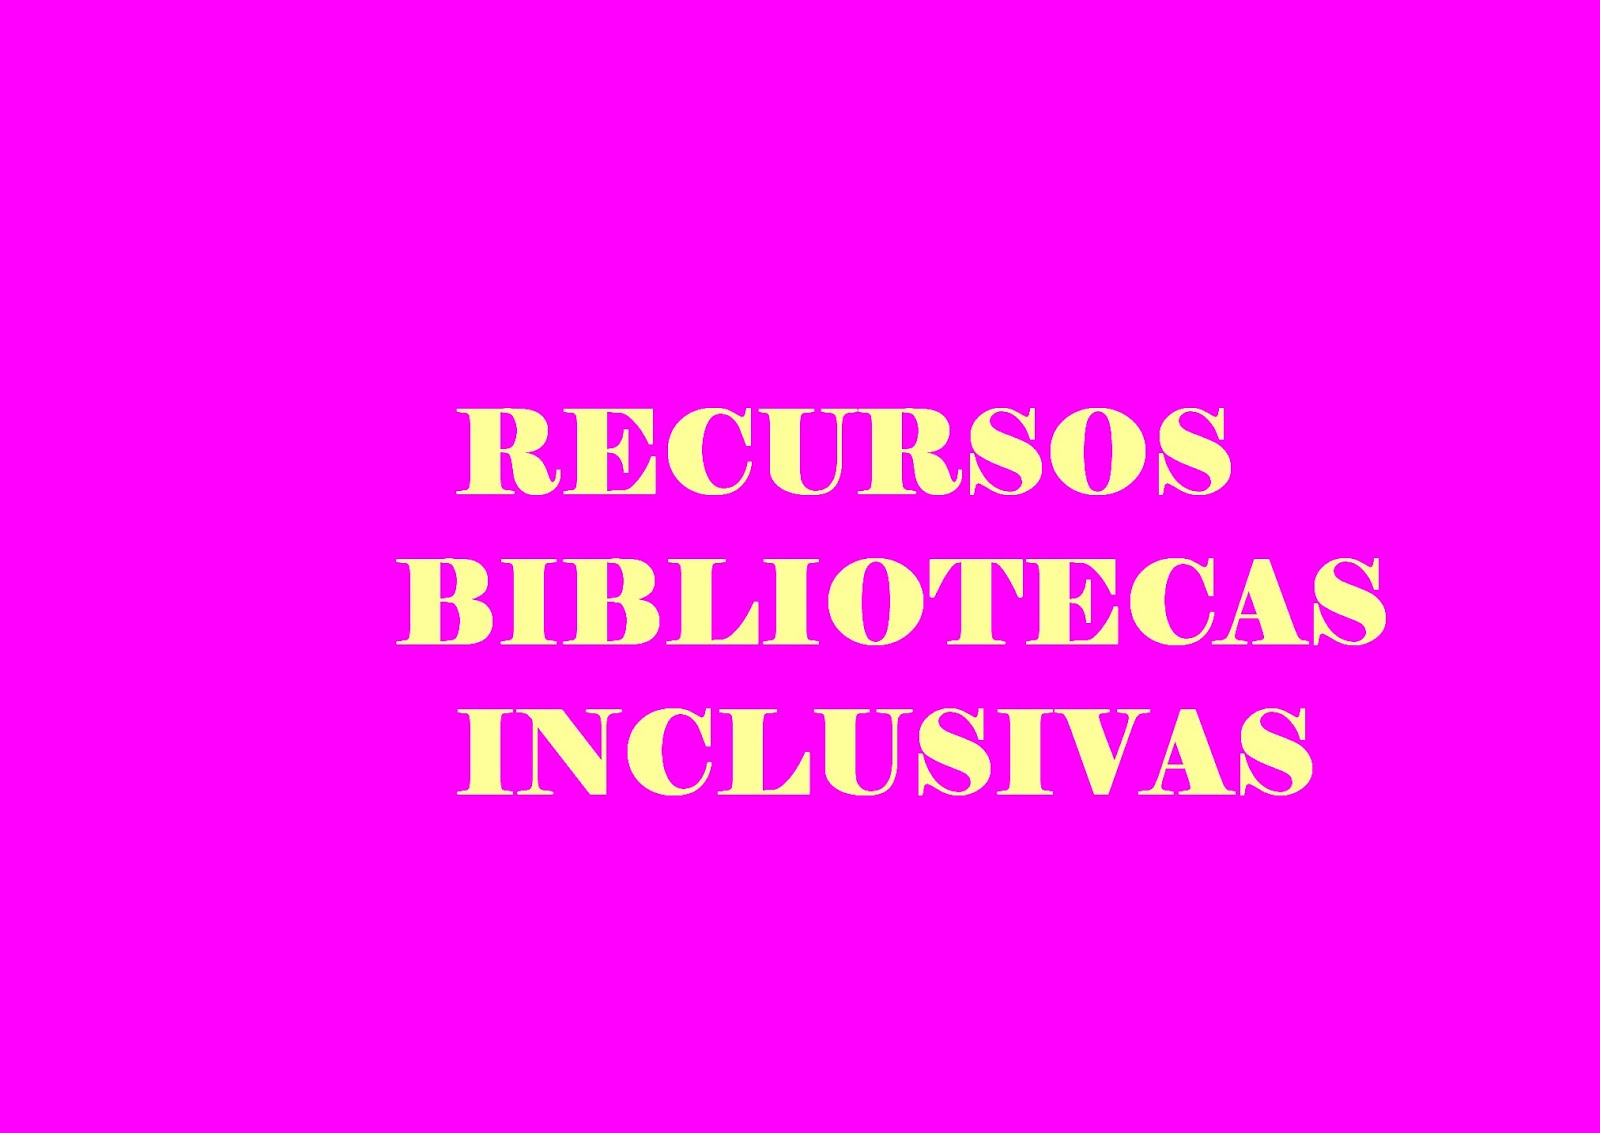 BIBLIOTECAS INCLUSIVAS